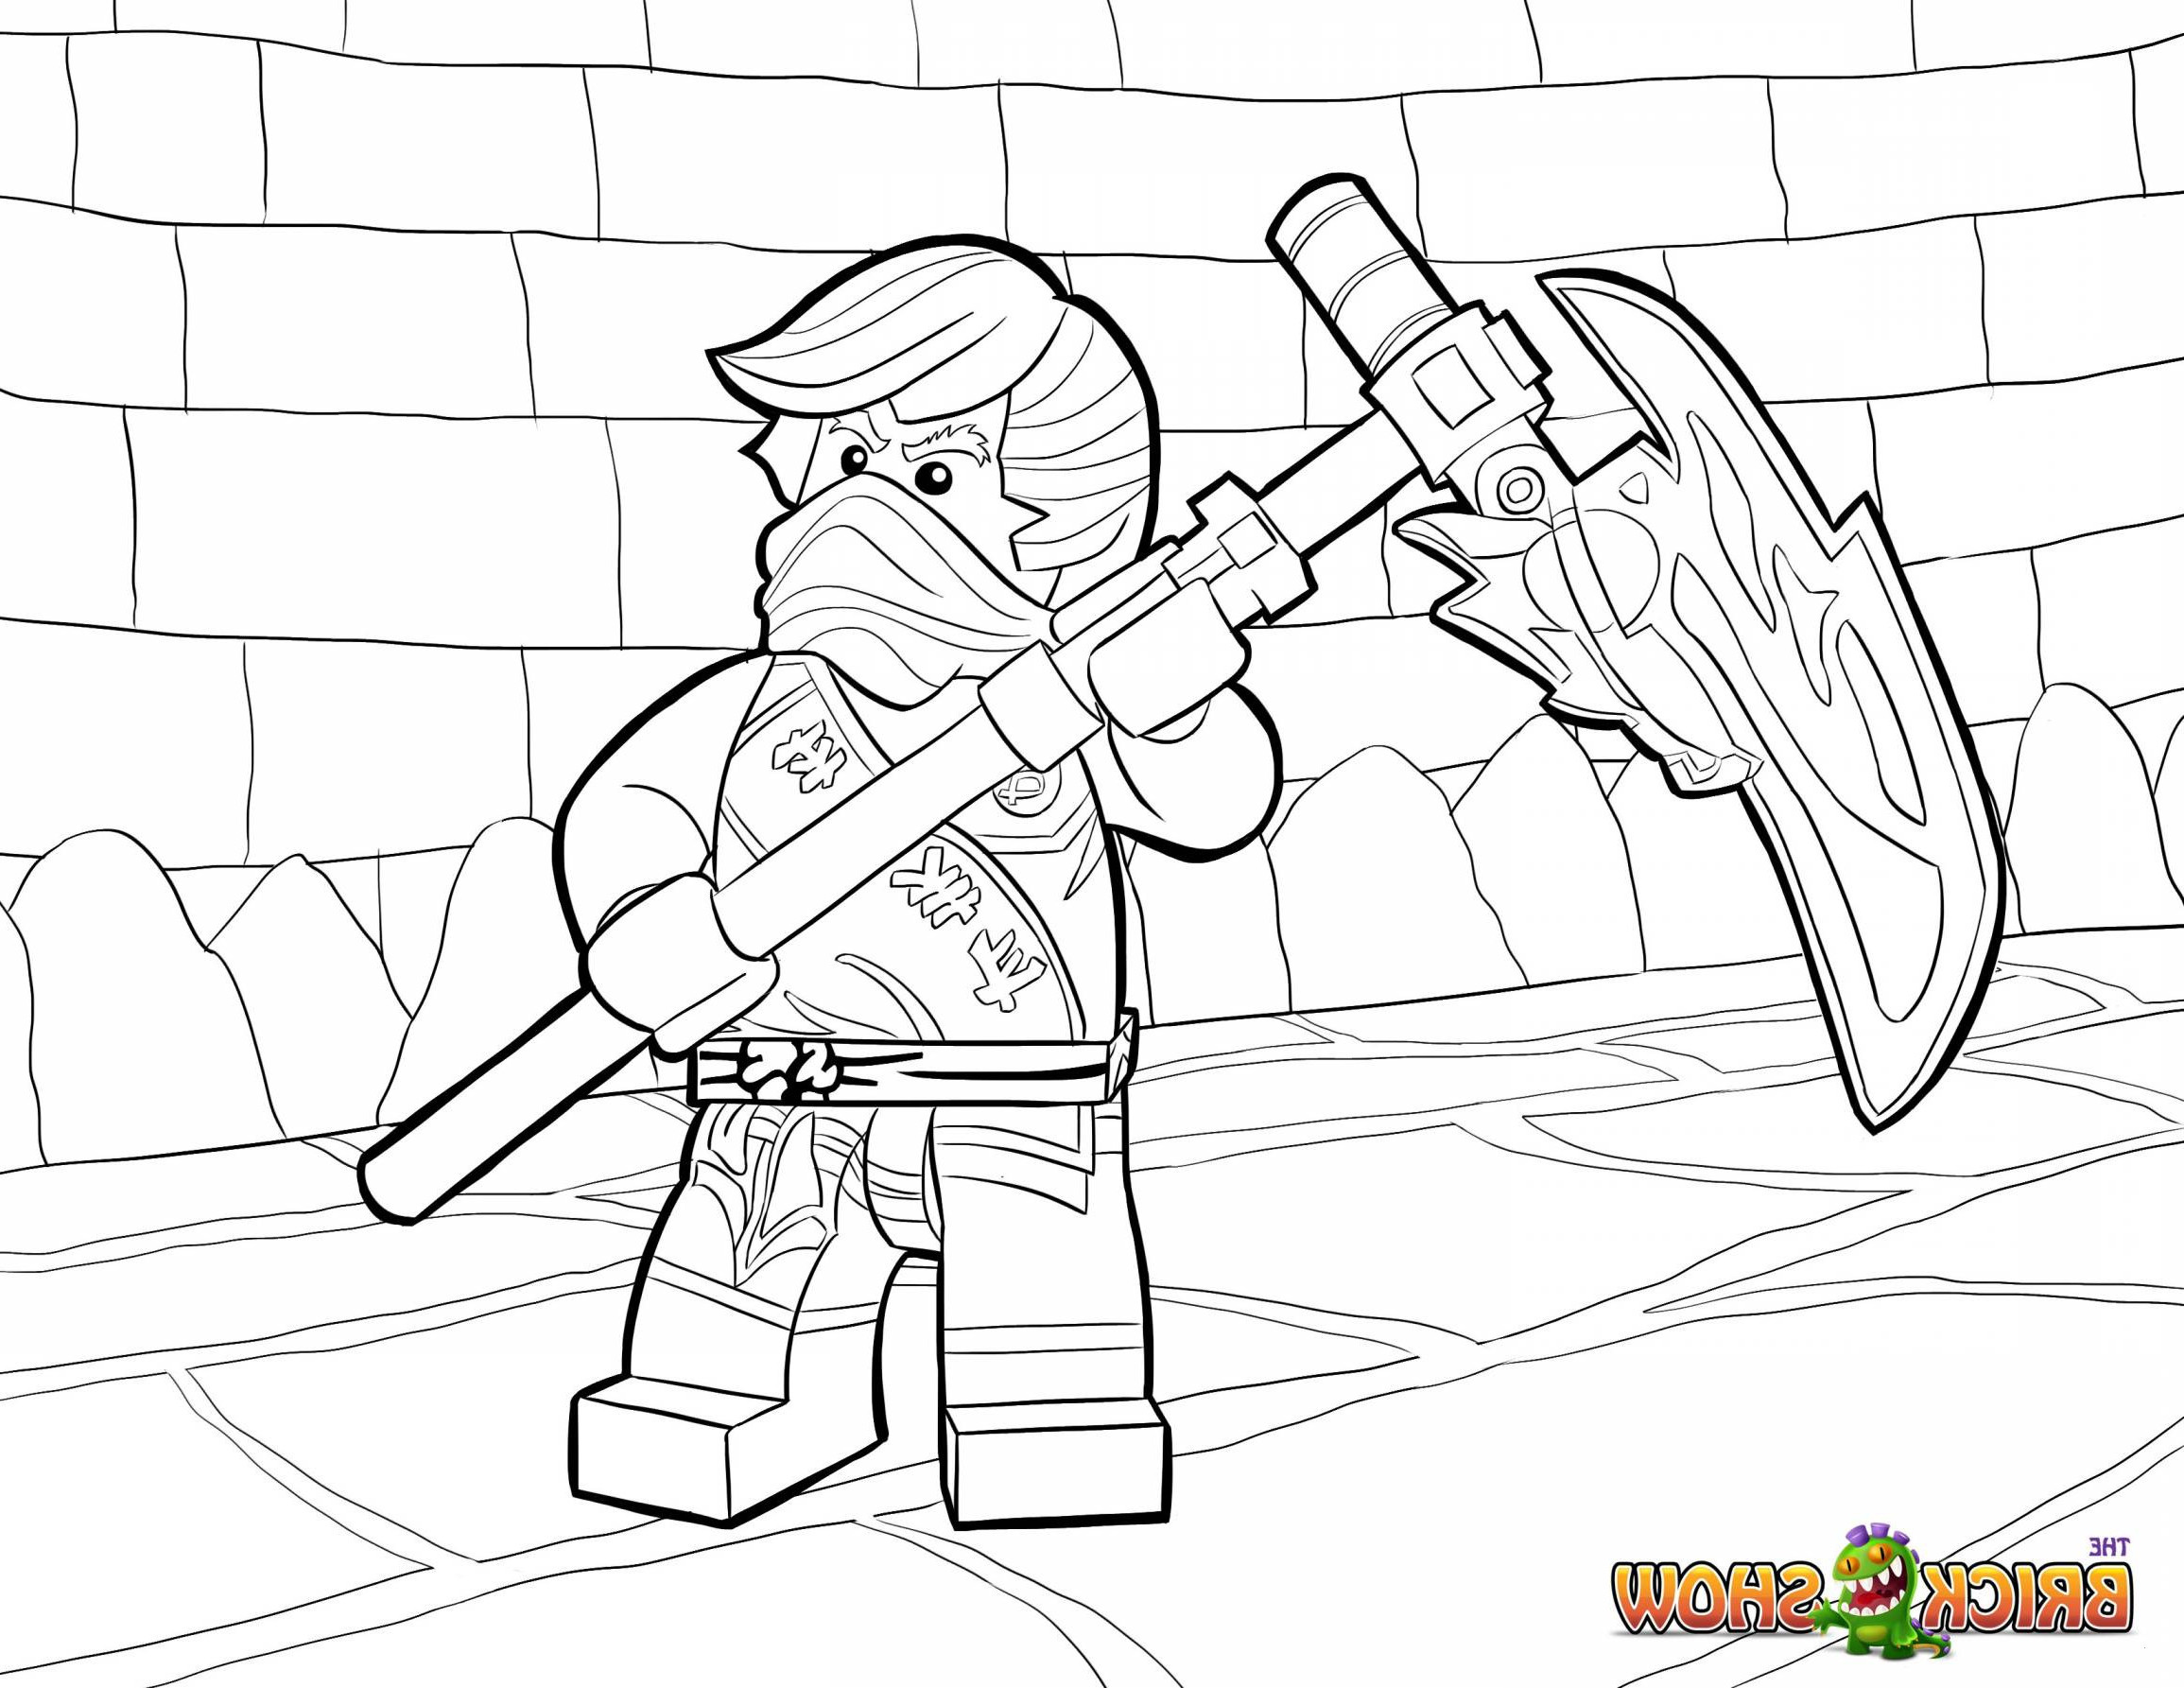 Ninjago Cole Ausmalbilder Frisch 25 Lecker Ausmalbild Ninjago – Malvorlagen Ideen Bild